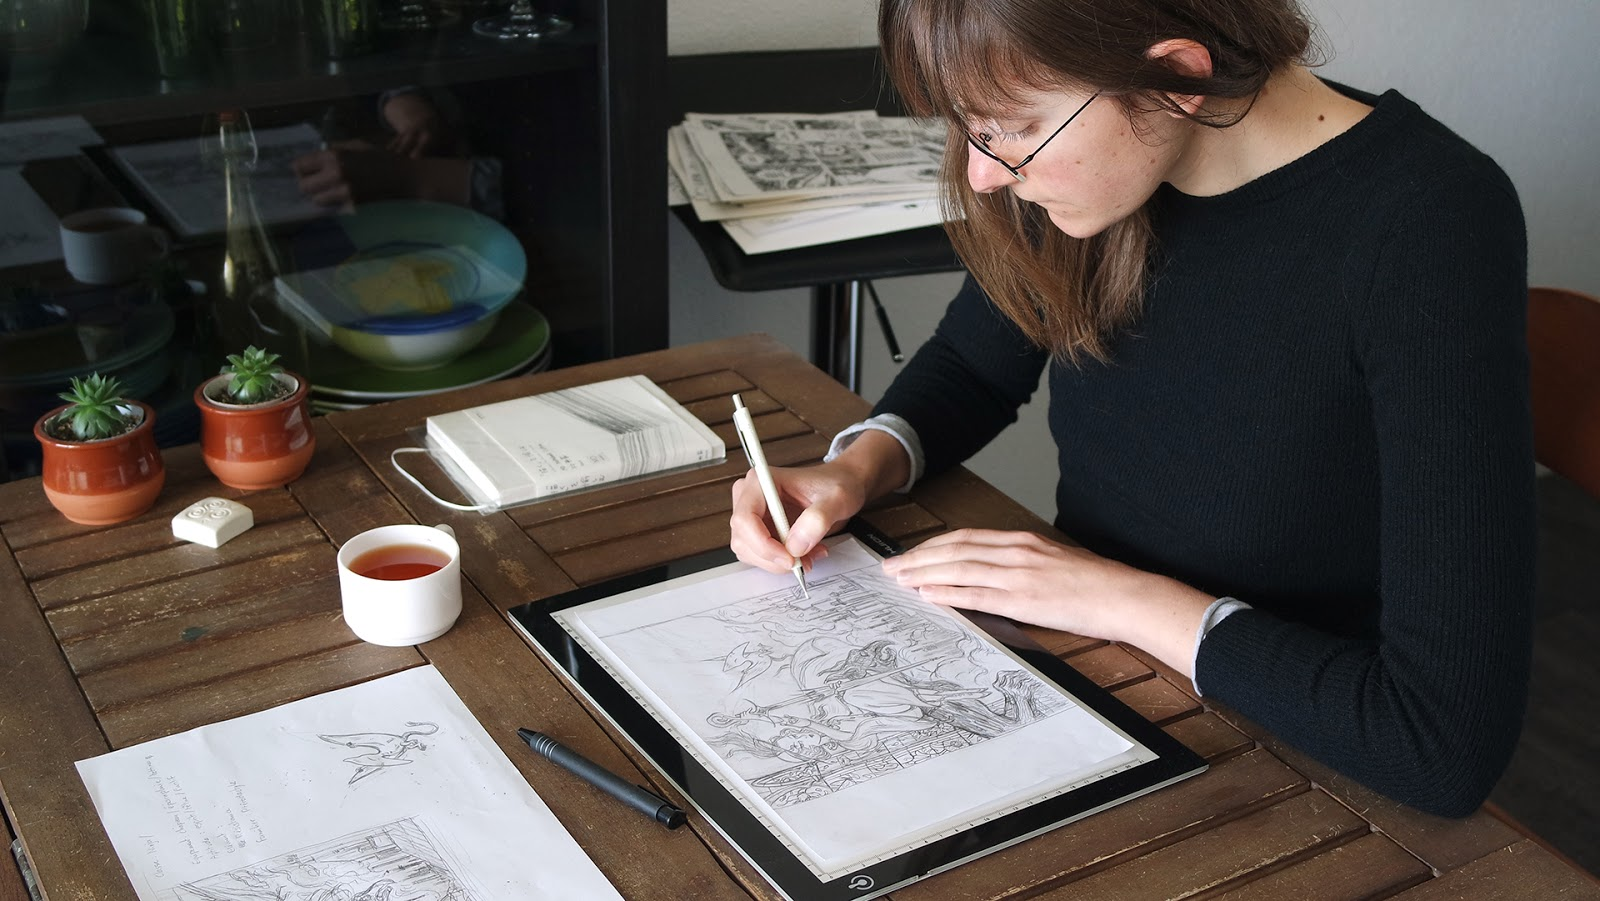 Atelier Sento's table